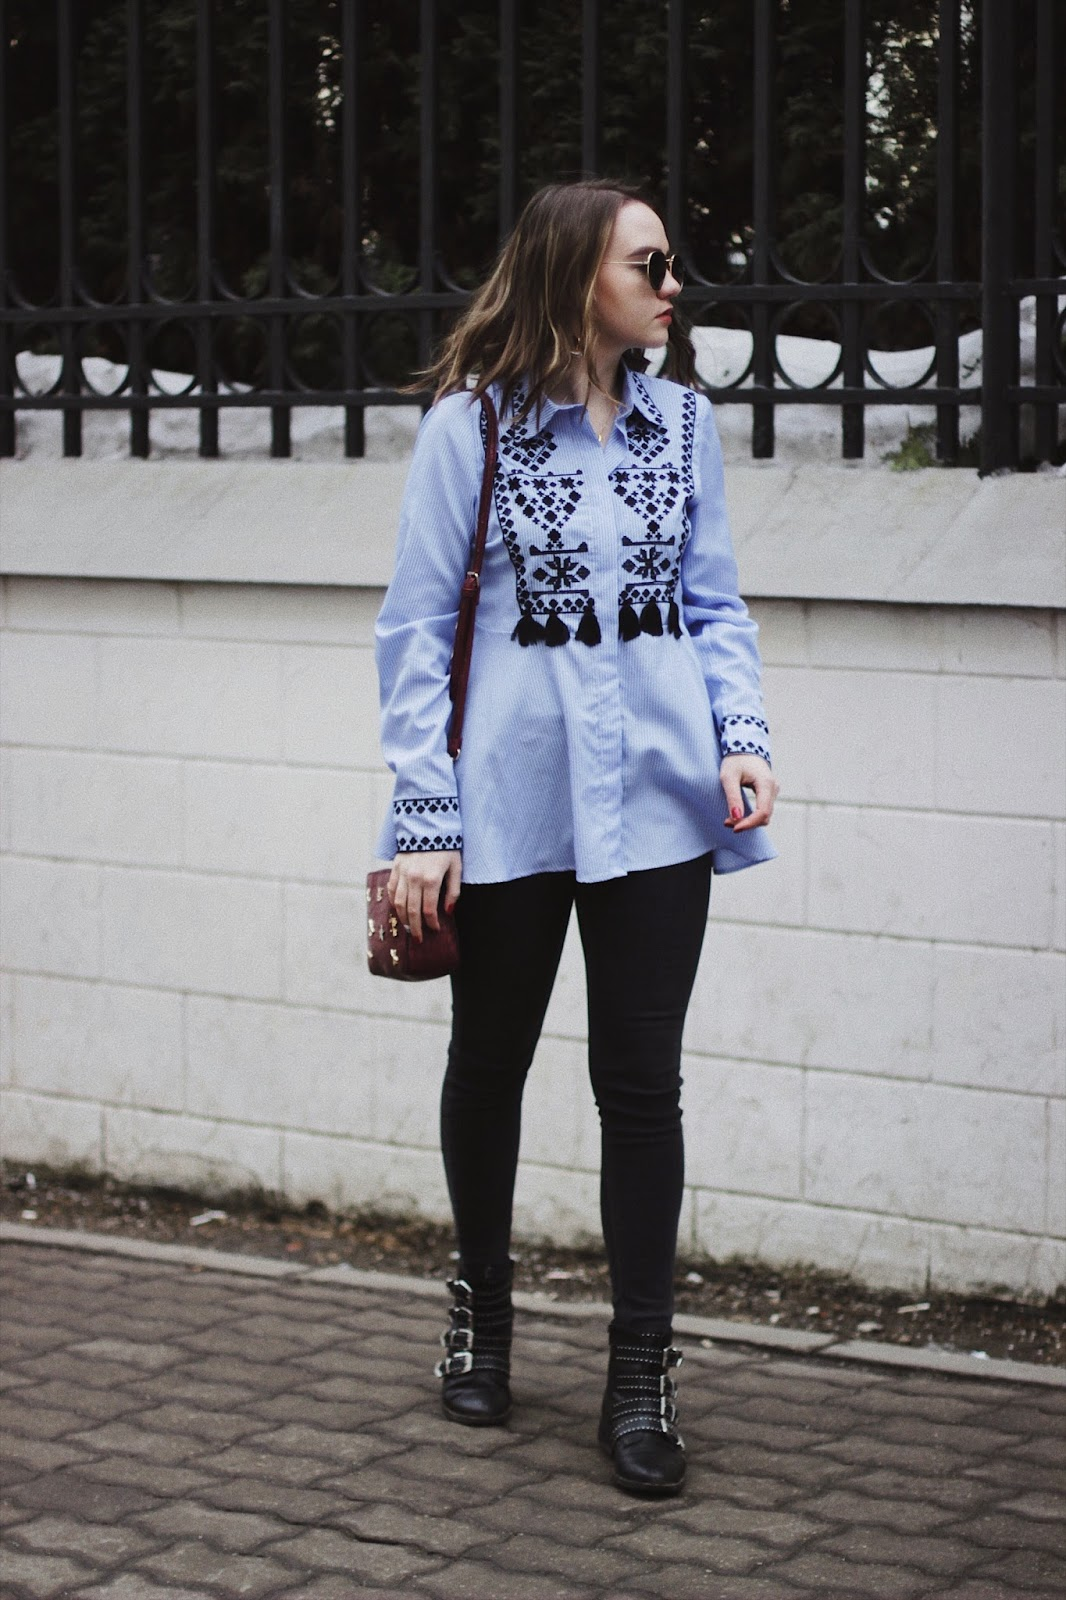 Blue Embroidery Shirt | Fashion Blogger